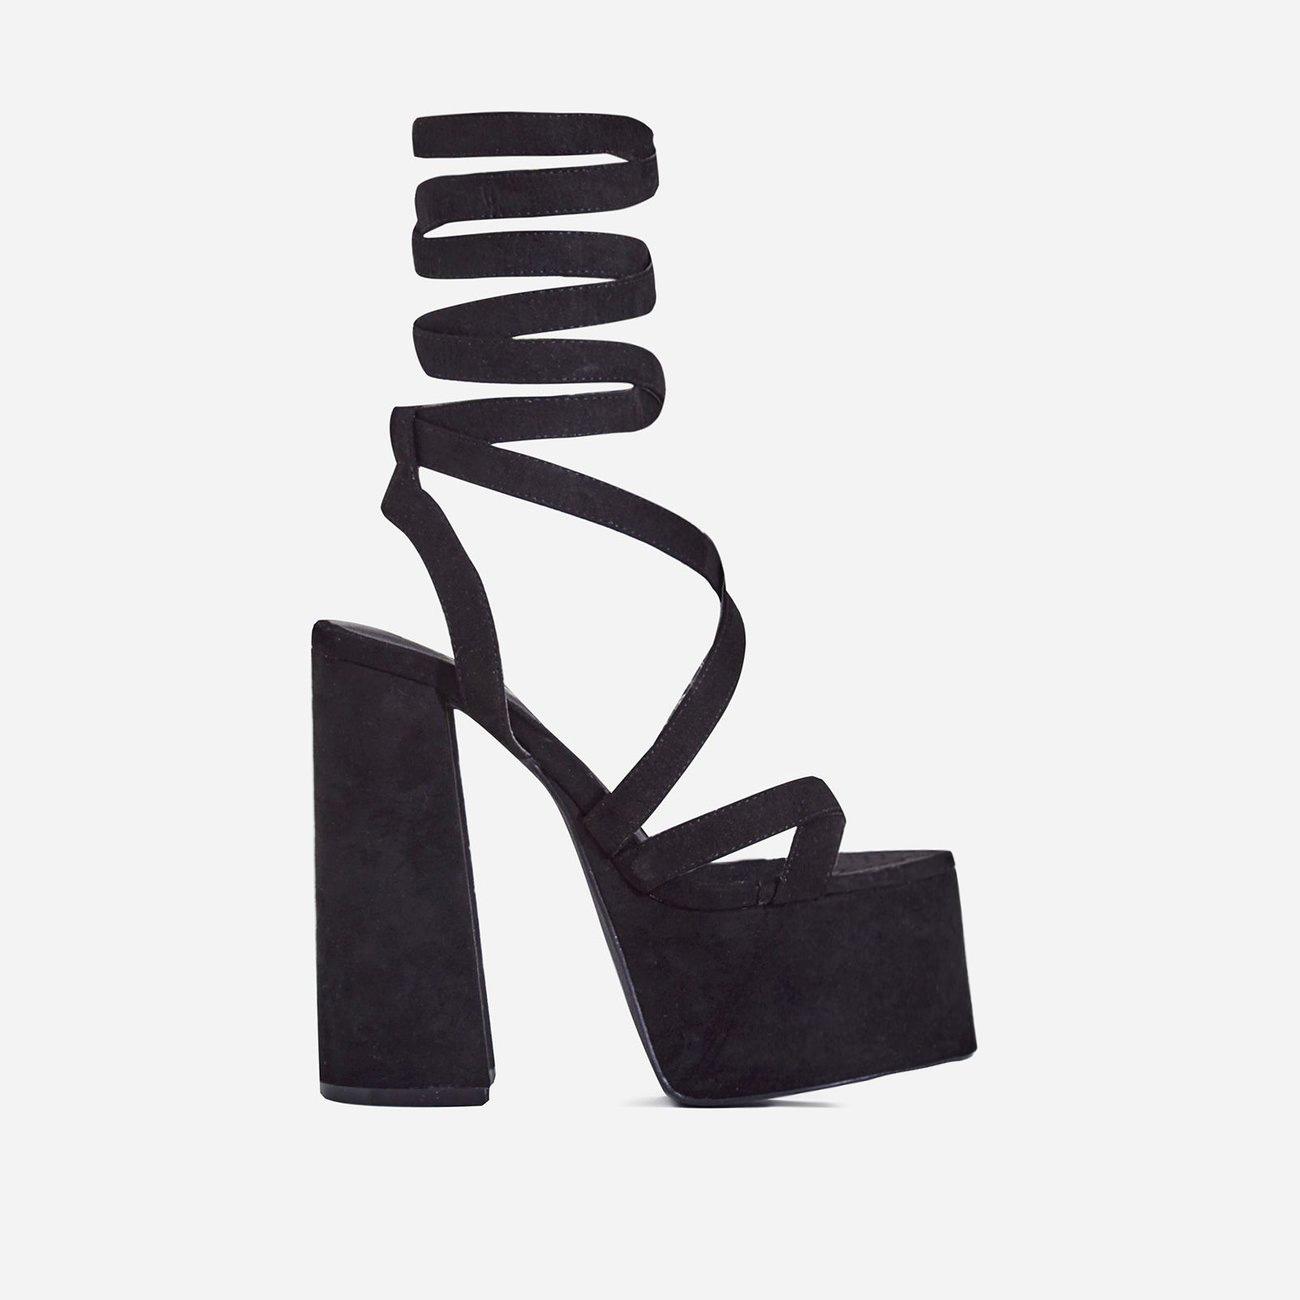 Harlow Lace Up Platform Heel In Black Faux Suede